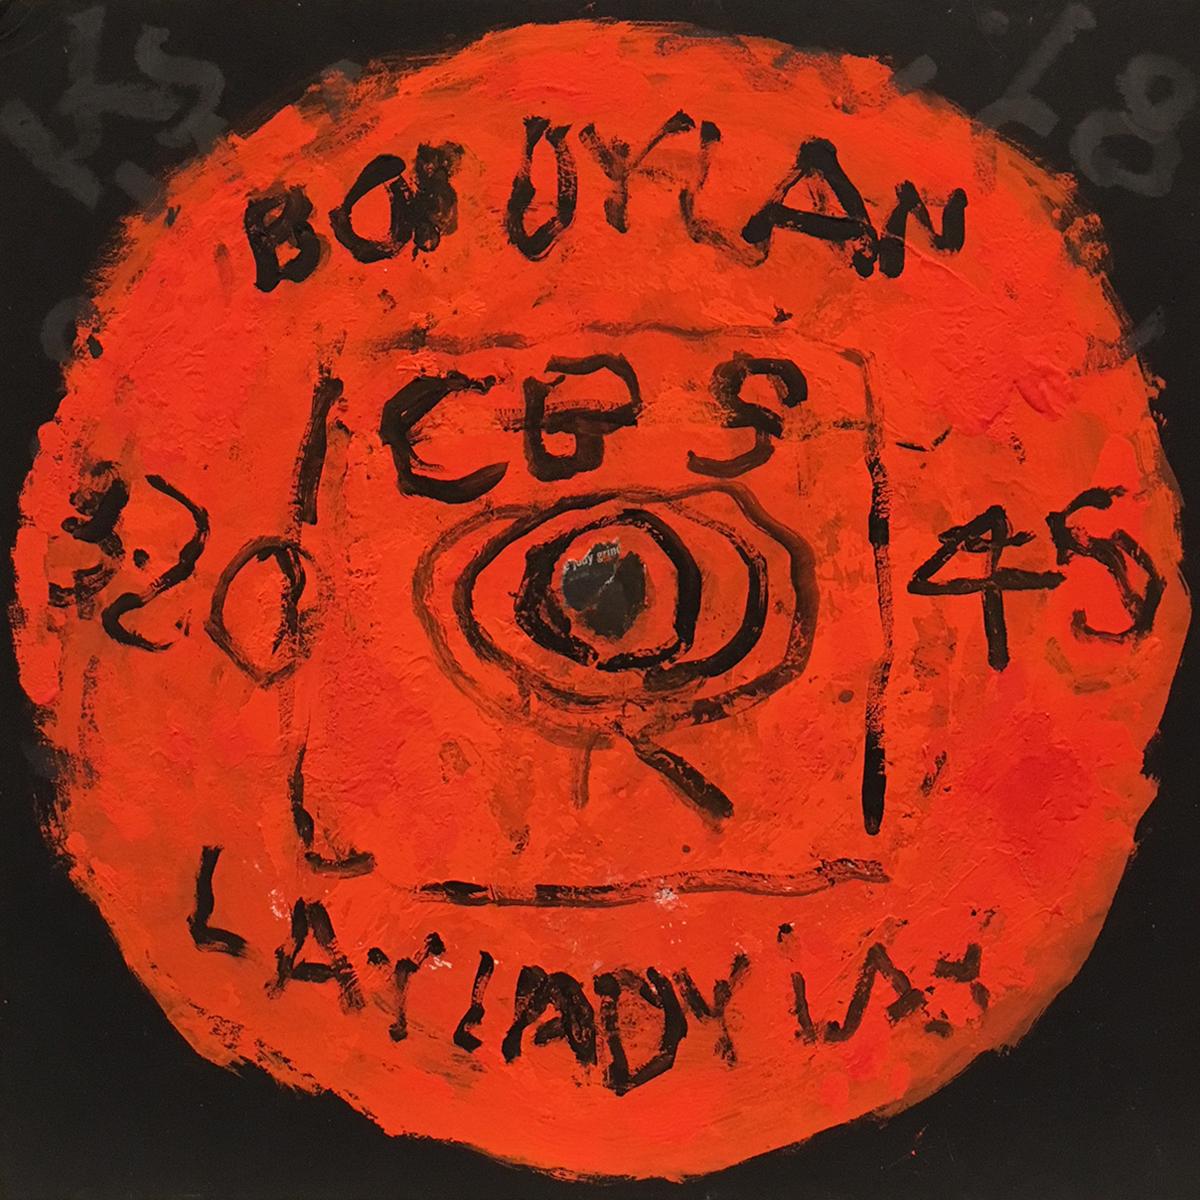 Bob Dylan / Lay Lady Lay